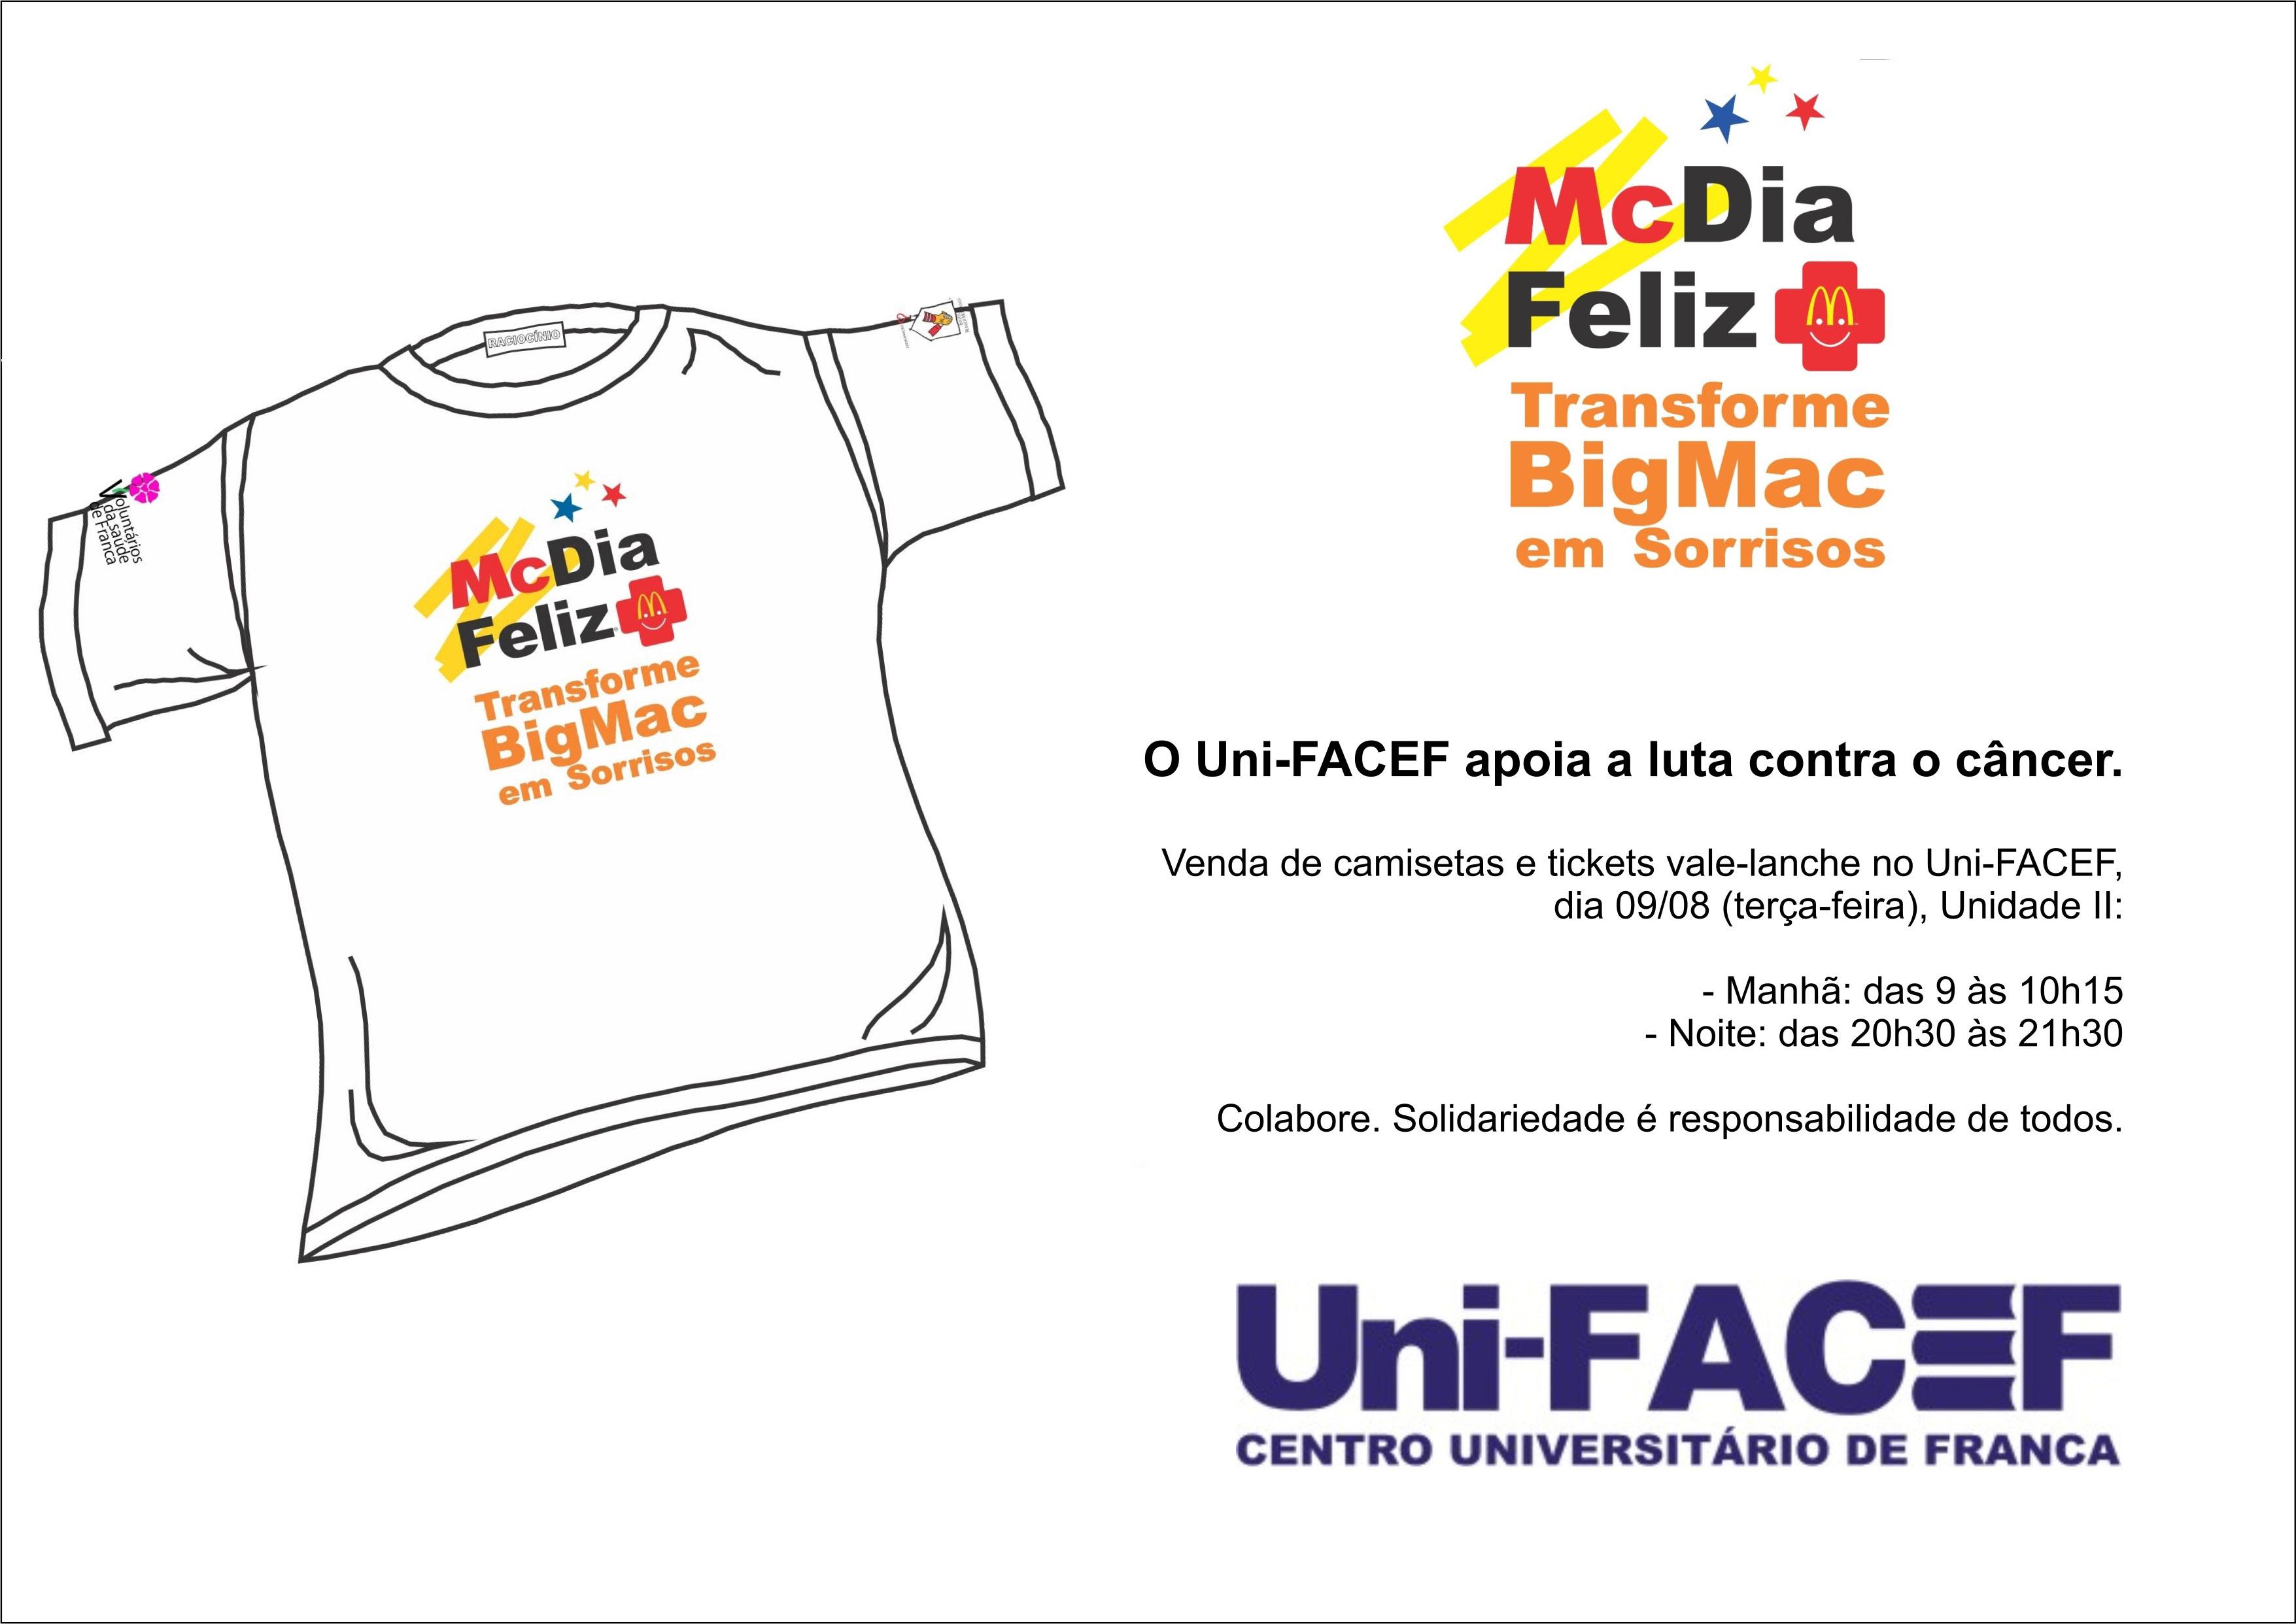 Uni-FACEF apoia a luta contra o câncer